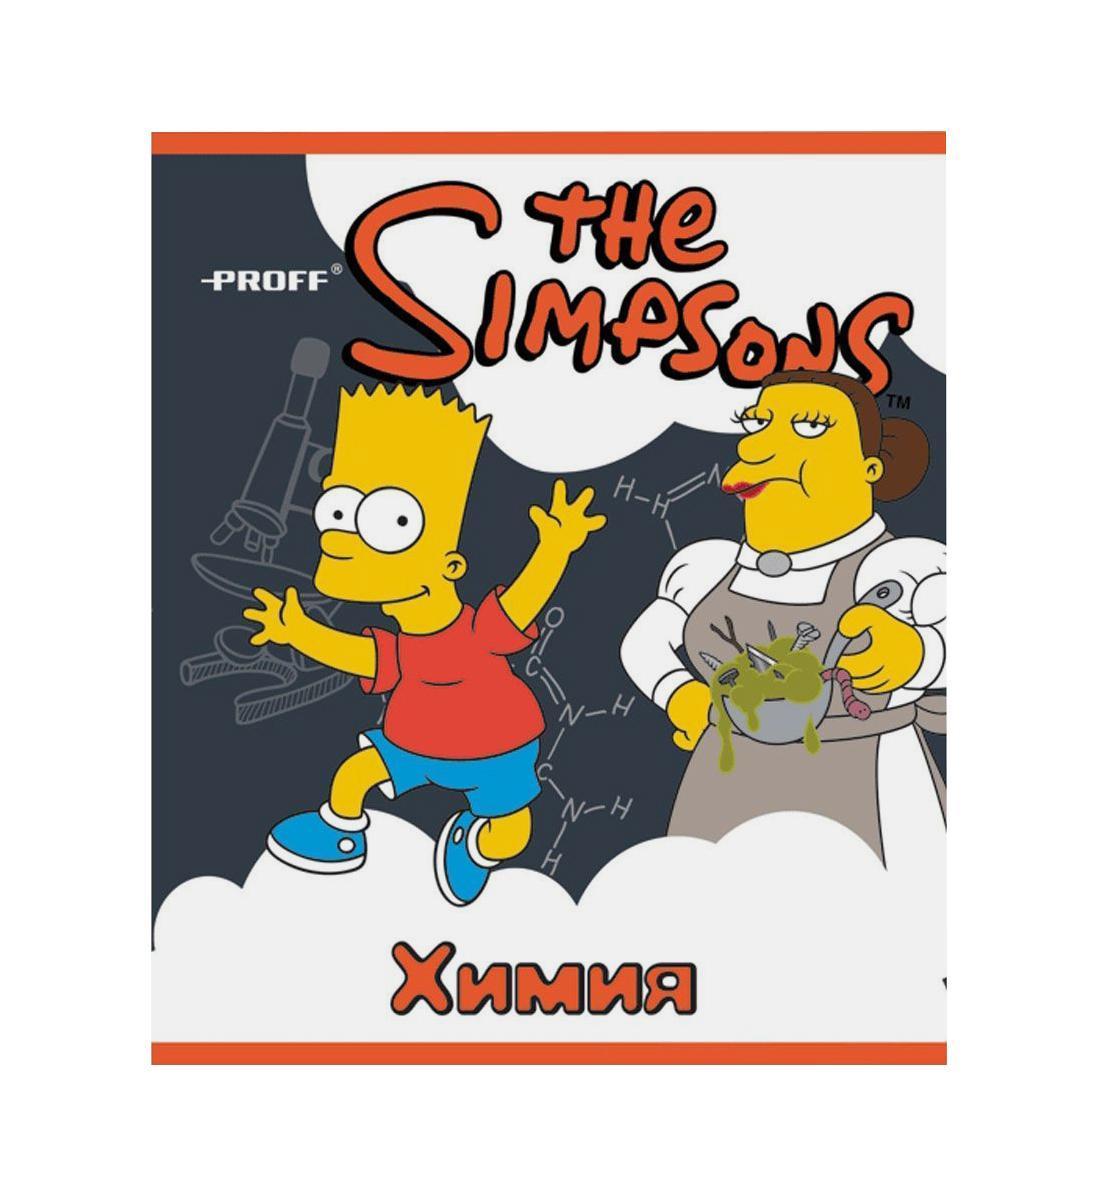 Тетрадь Proff The Simpsons The Simpsons SI14-CEBS48SI14-CEBS48Разметка: В клетку. Формат: А5. Обложка: Картон, . Пол: Унисекс. Возраст: Средние классы. Крепление: Скрепки.